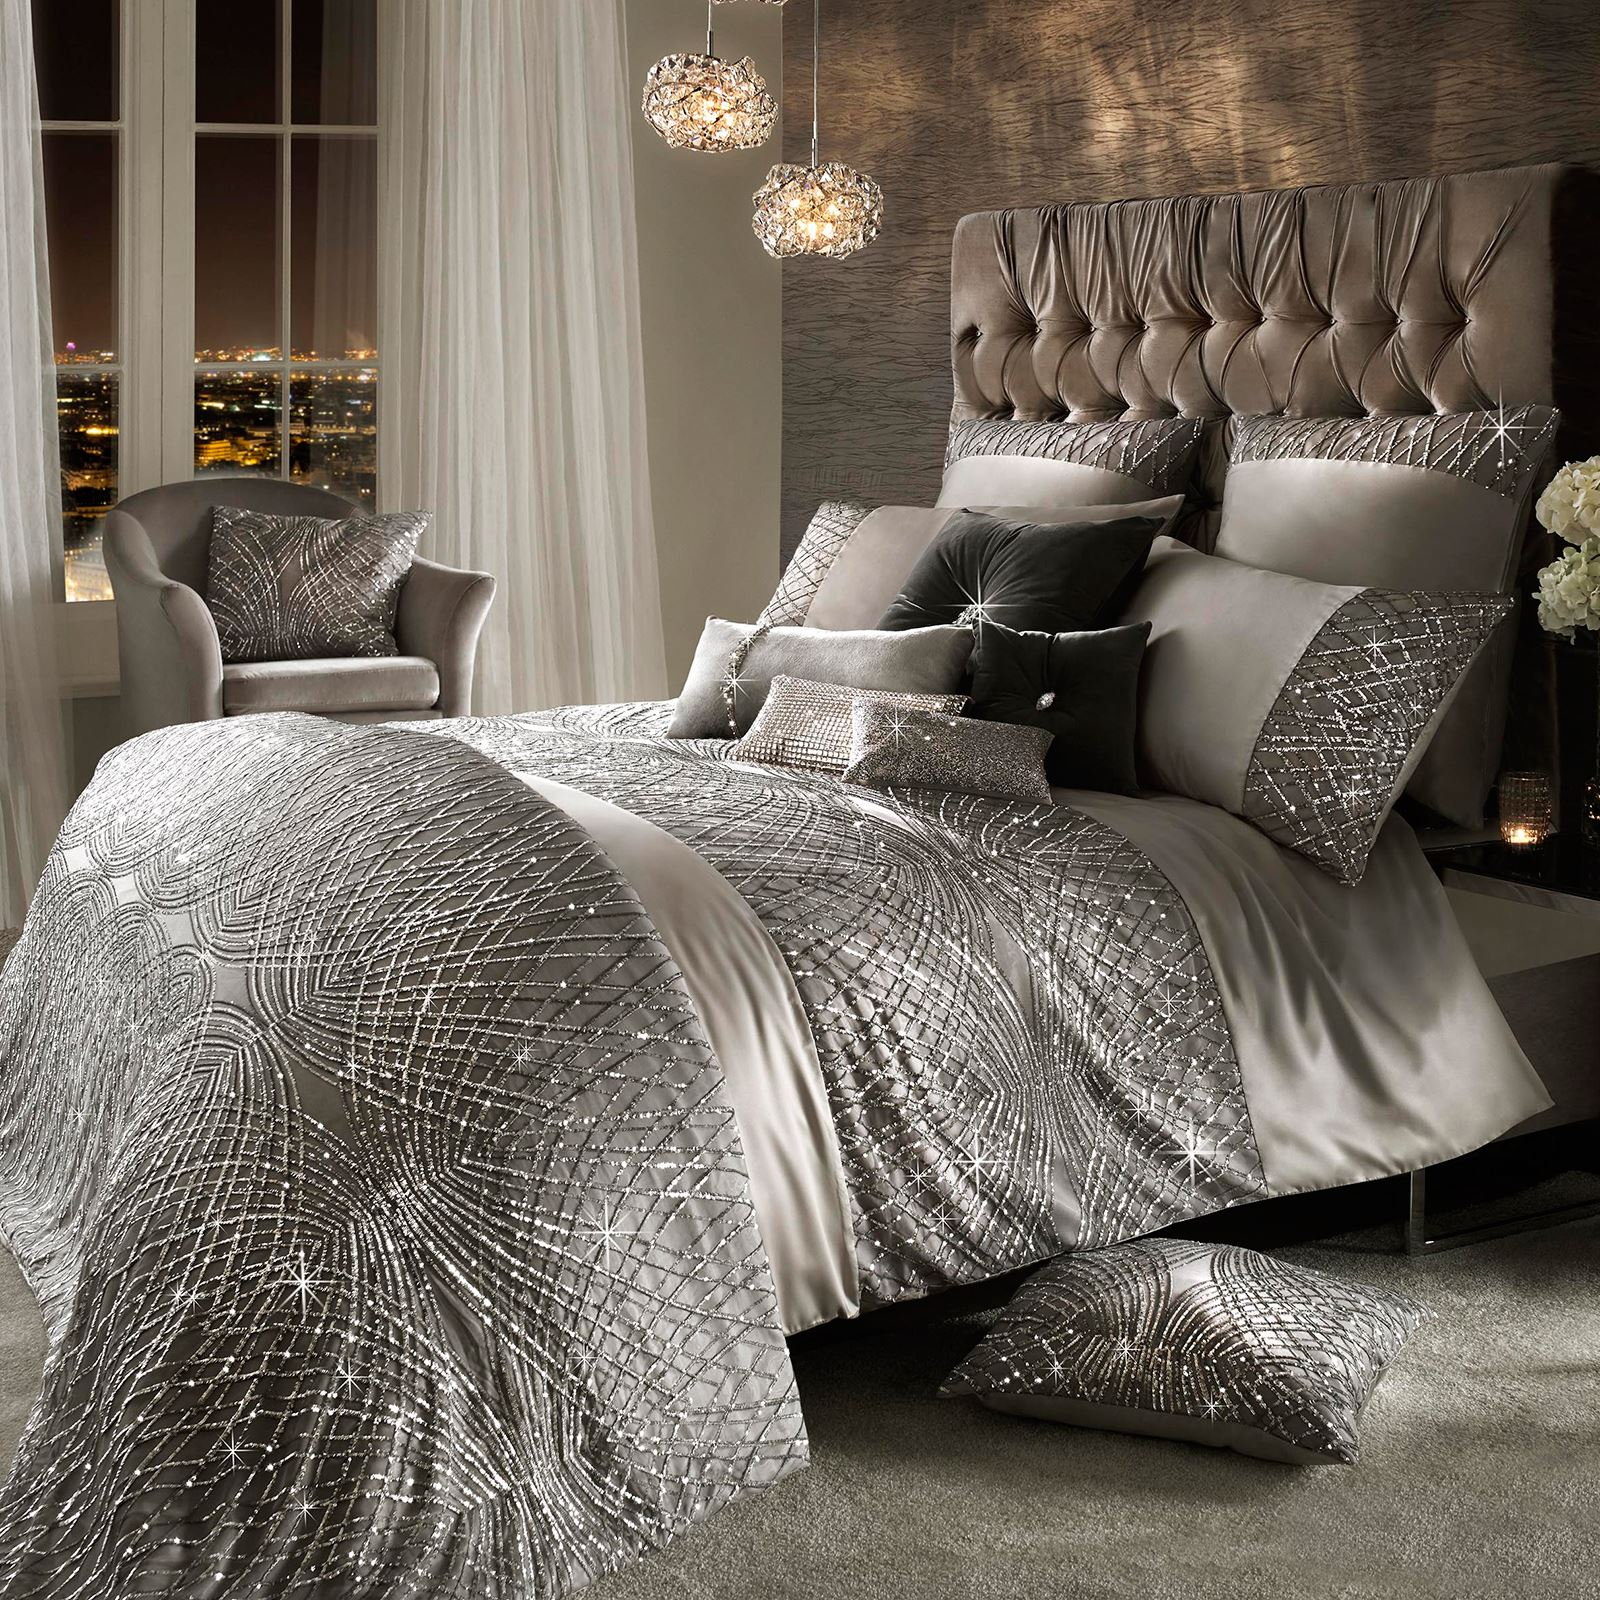 kylie minogue esta silver duvet covers pillowcases satin. Black Bedroom Furniture Sets. Home Design Ideas